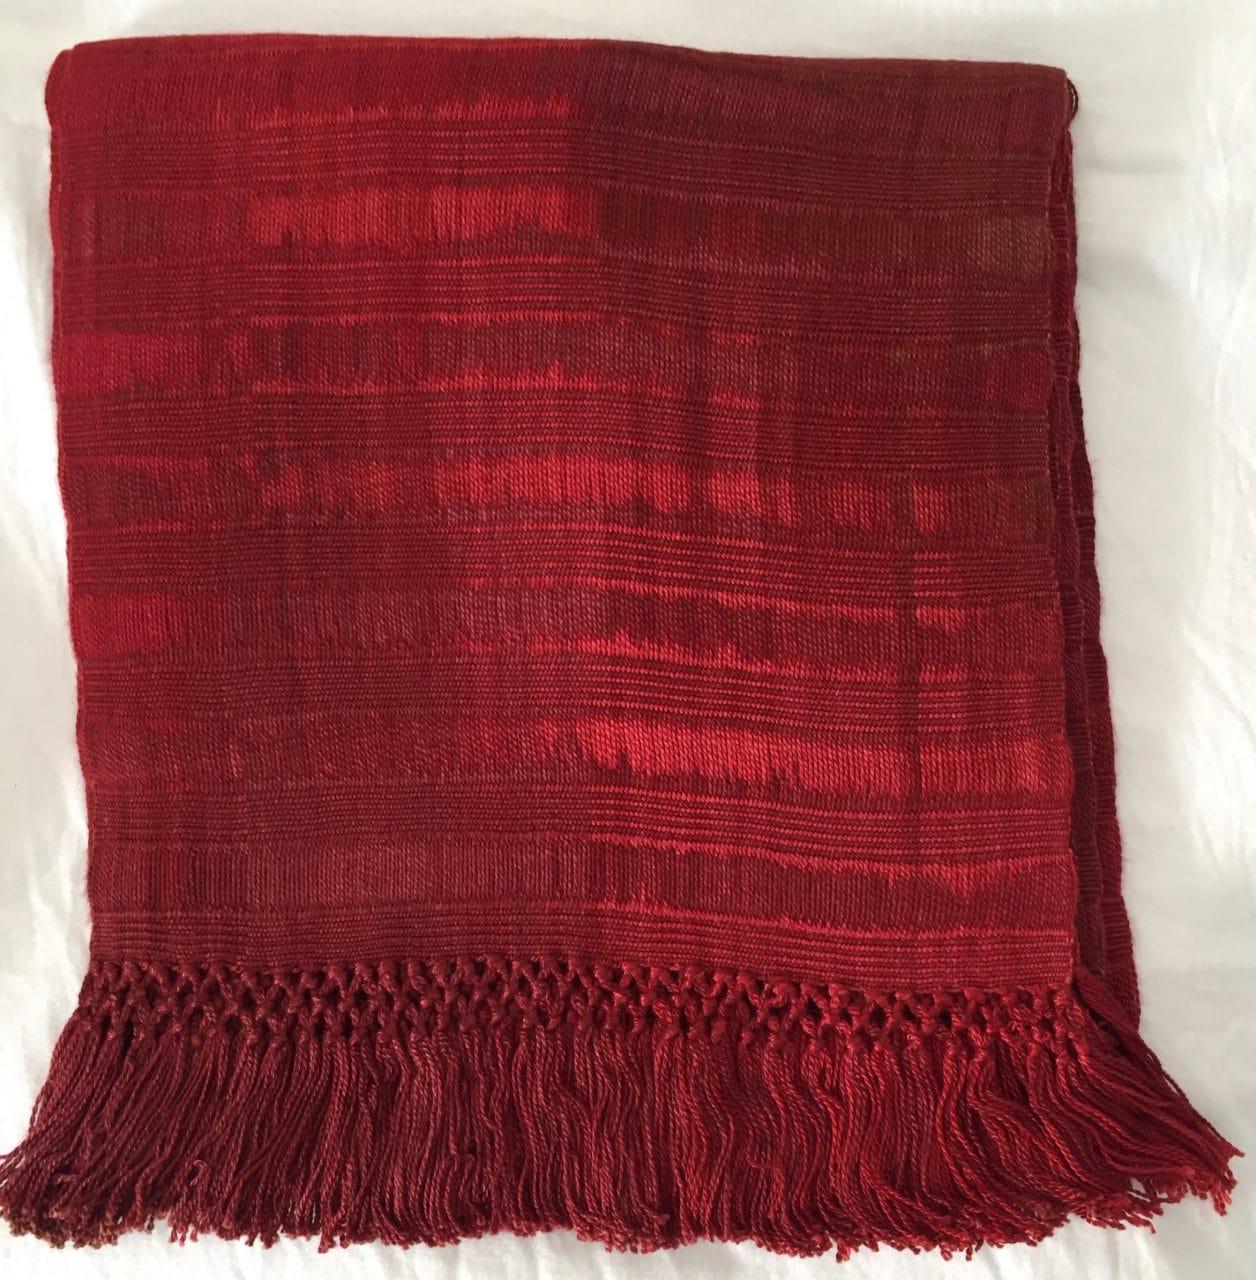 Reds - Lightweight Bamboo Open-Weave Handwoven Scarf 8 x 68